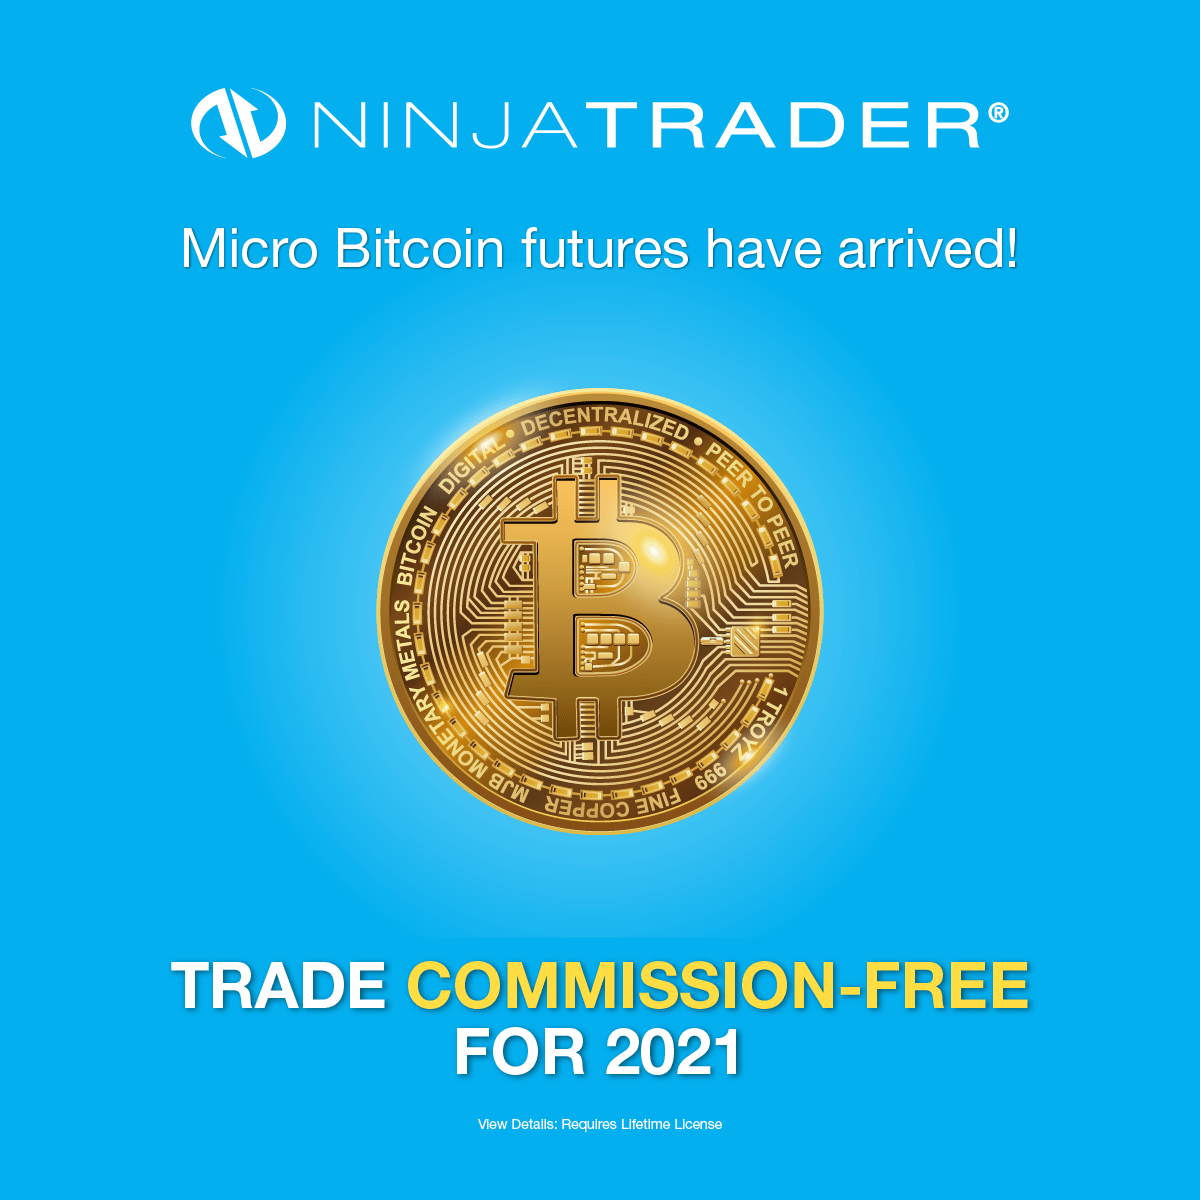 bitcoin futures ninjatrader